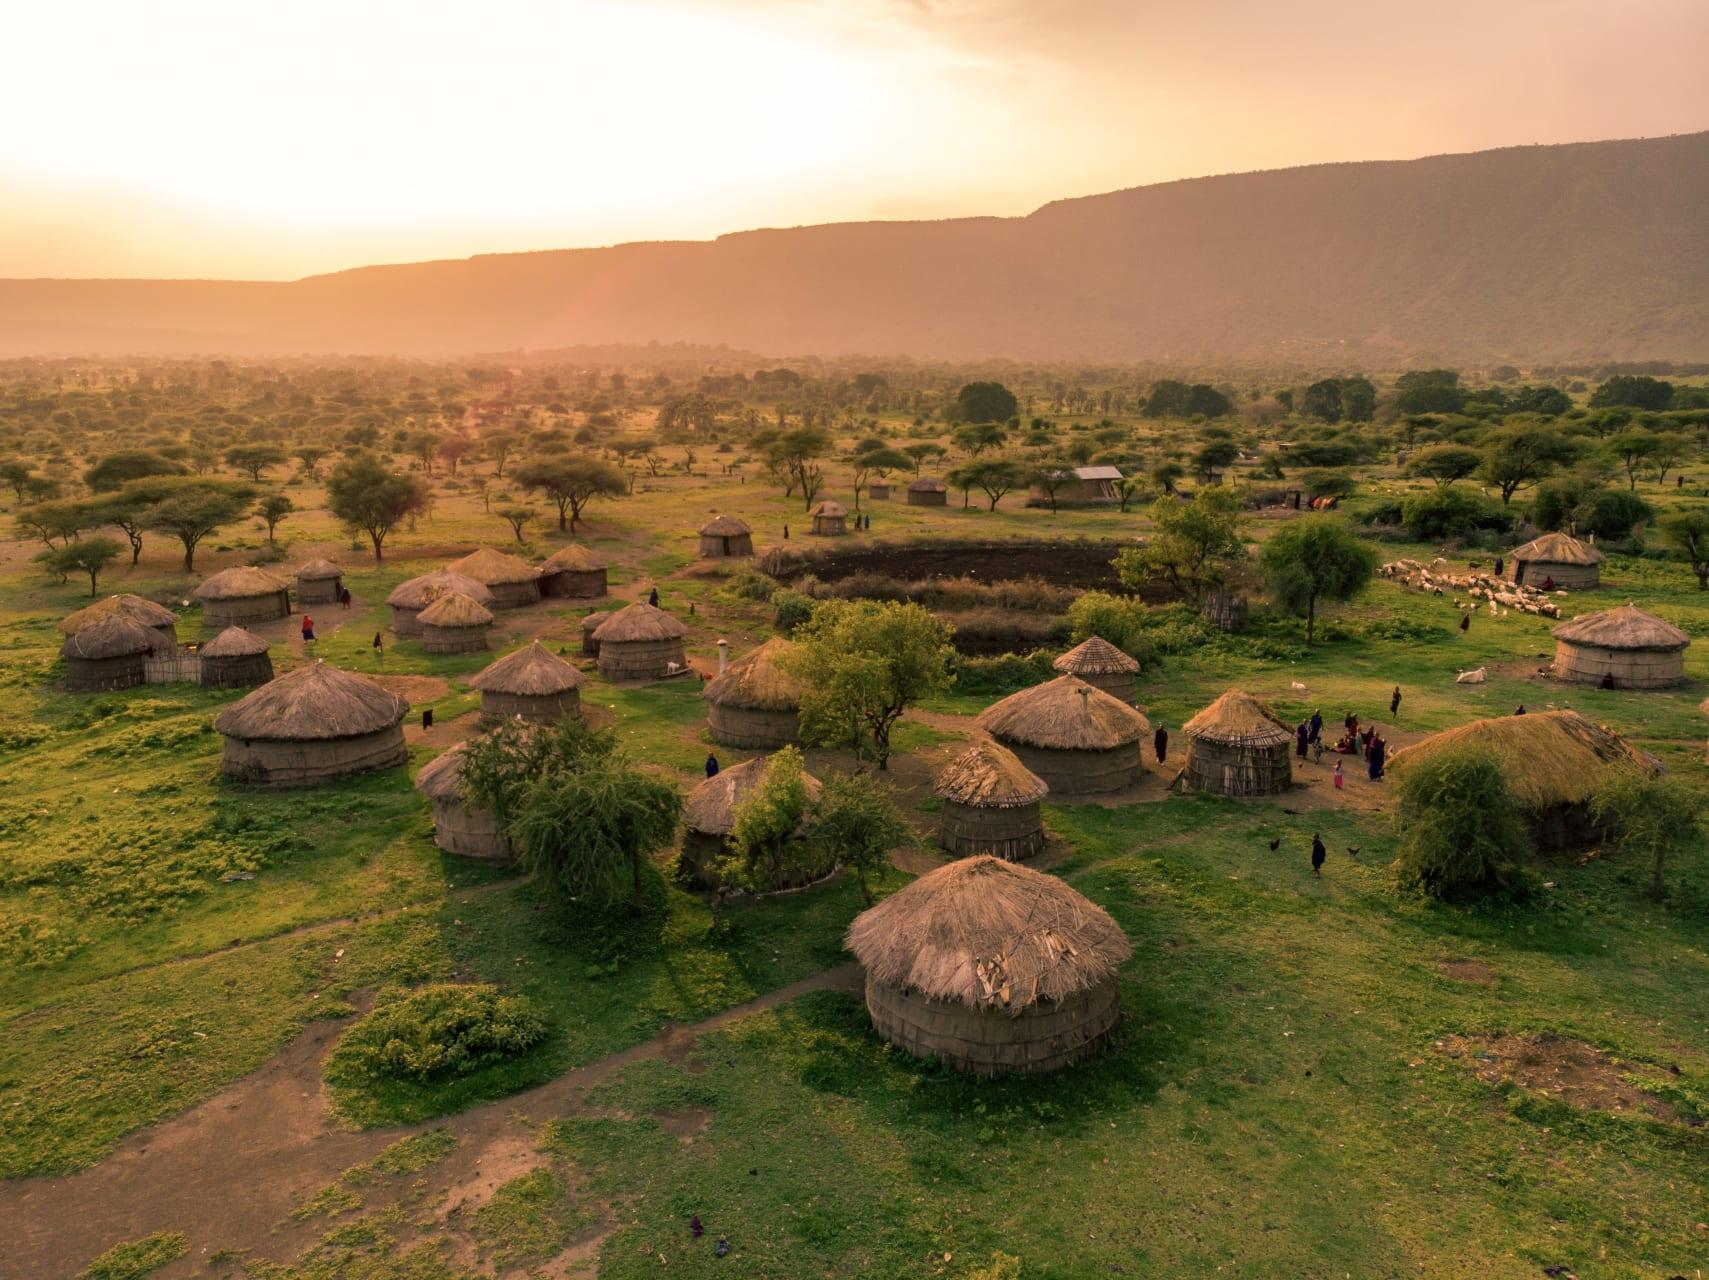 Maasai Villages